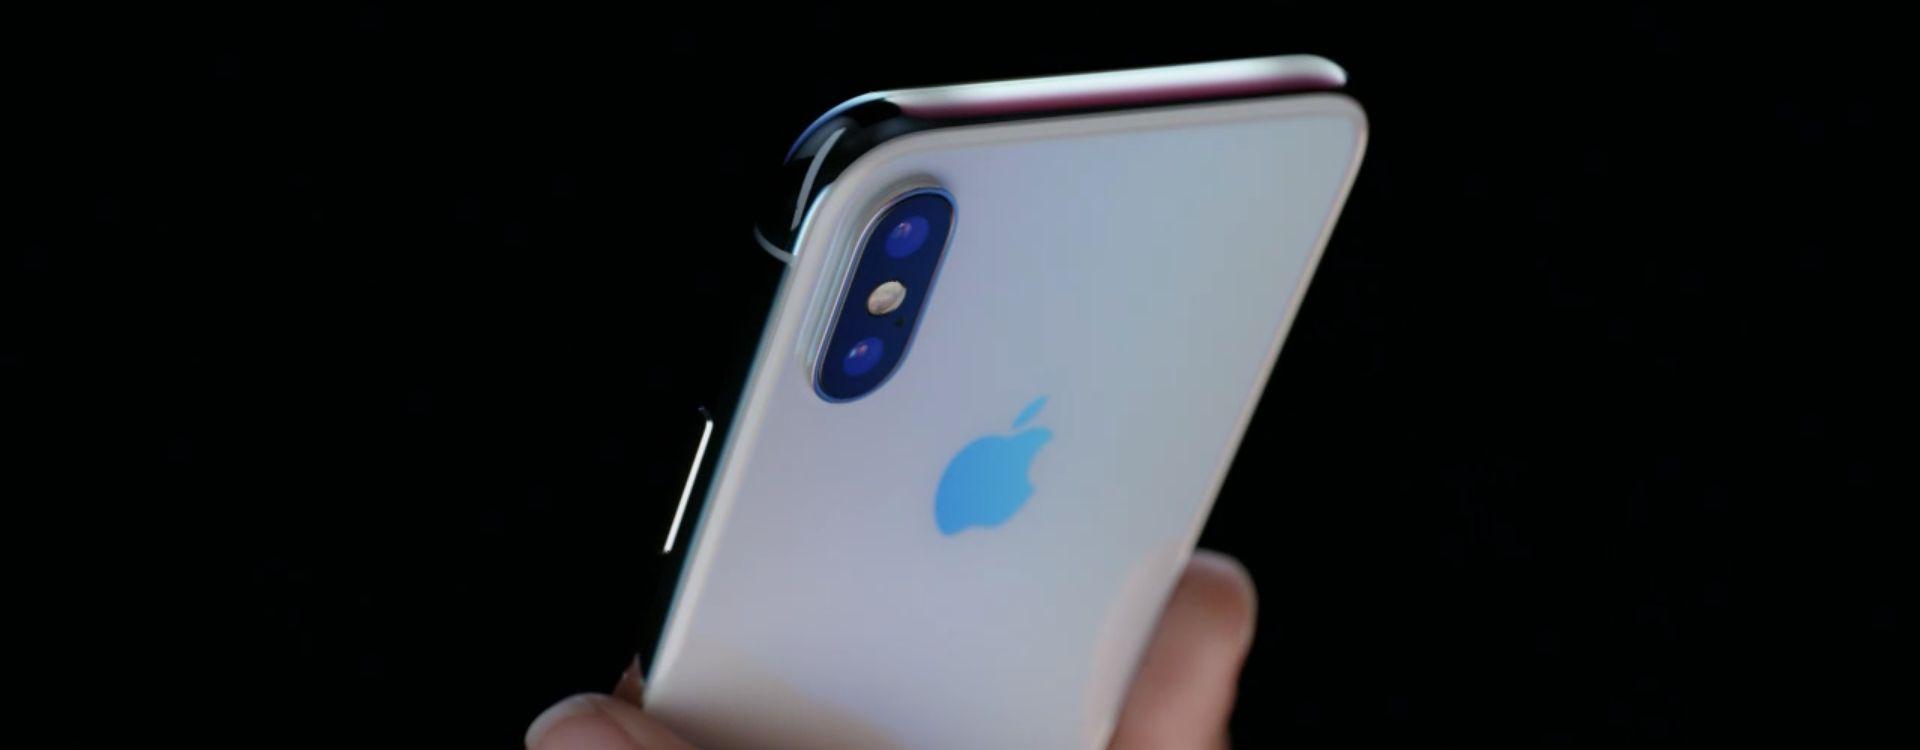 Iphone X Iphone 8 I Iphone 8 Plus Co Potrafią Ich Aparaty